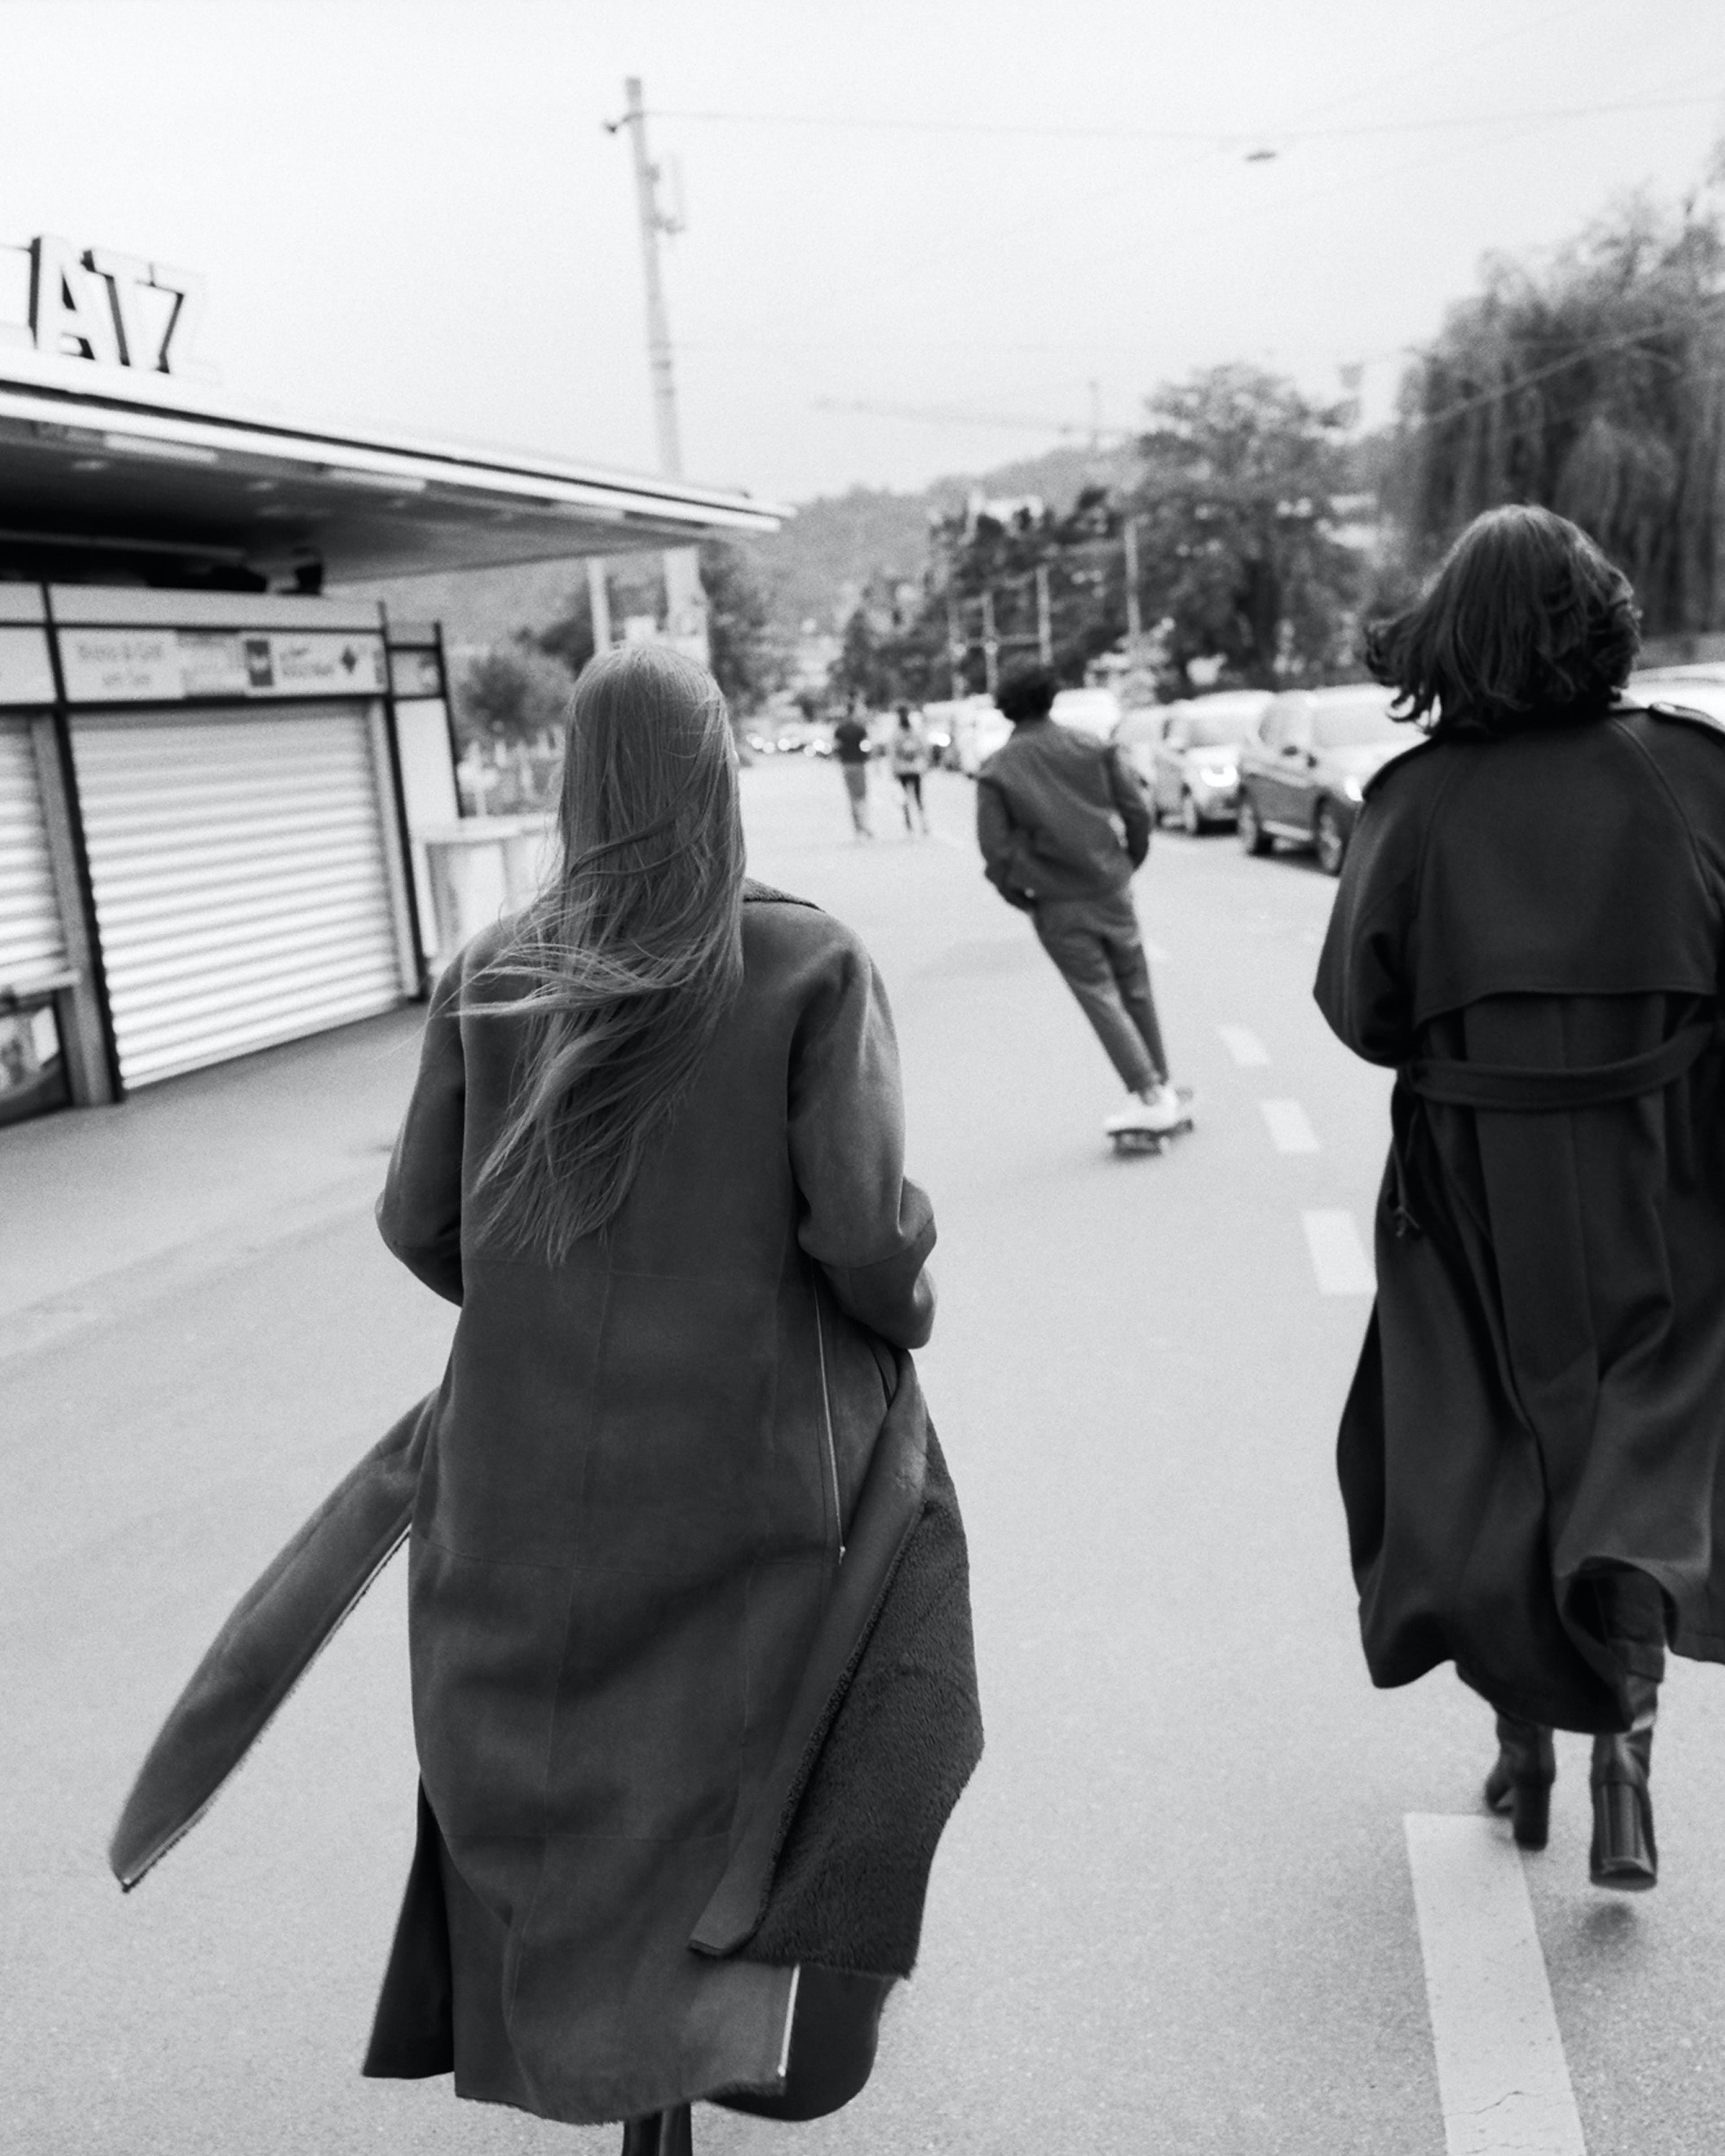 Damen schwarz weiss Mantel